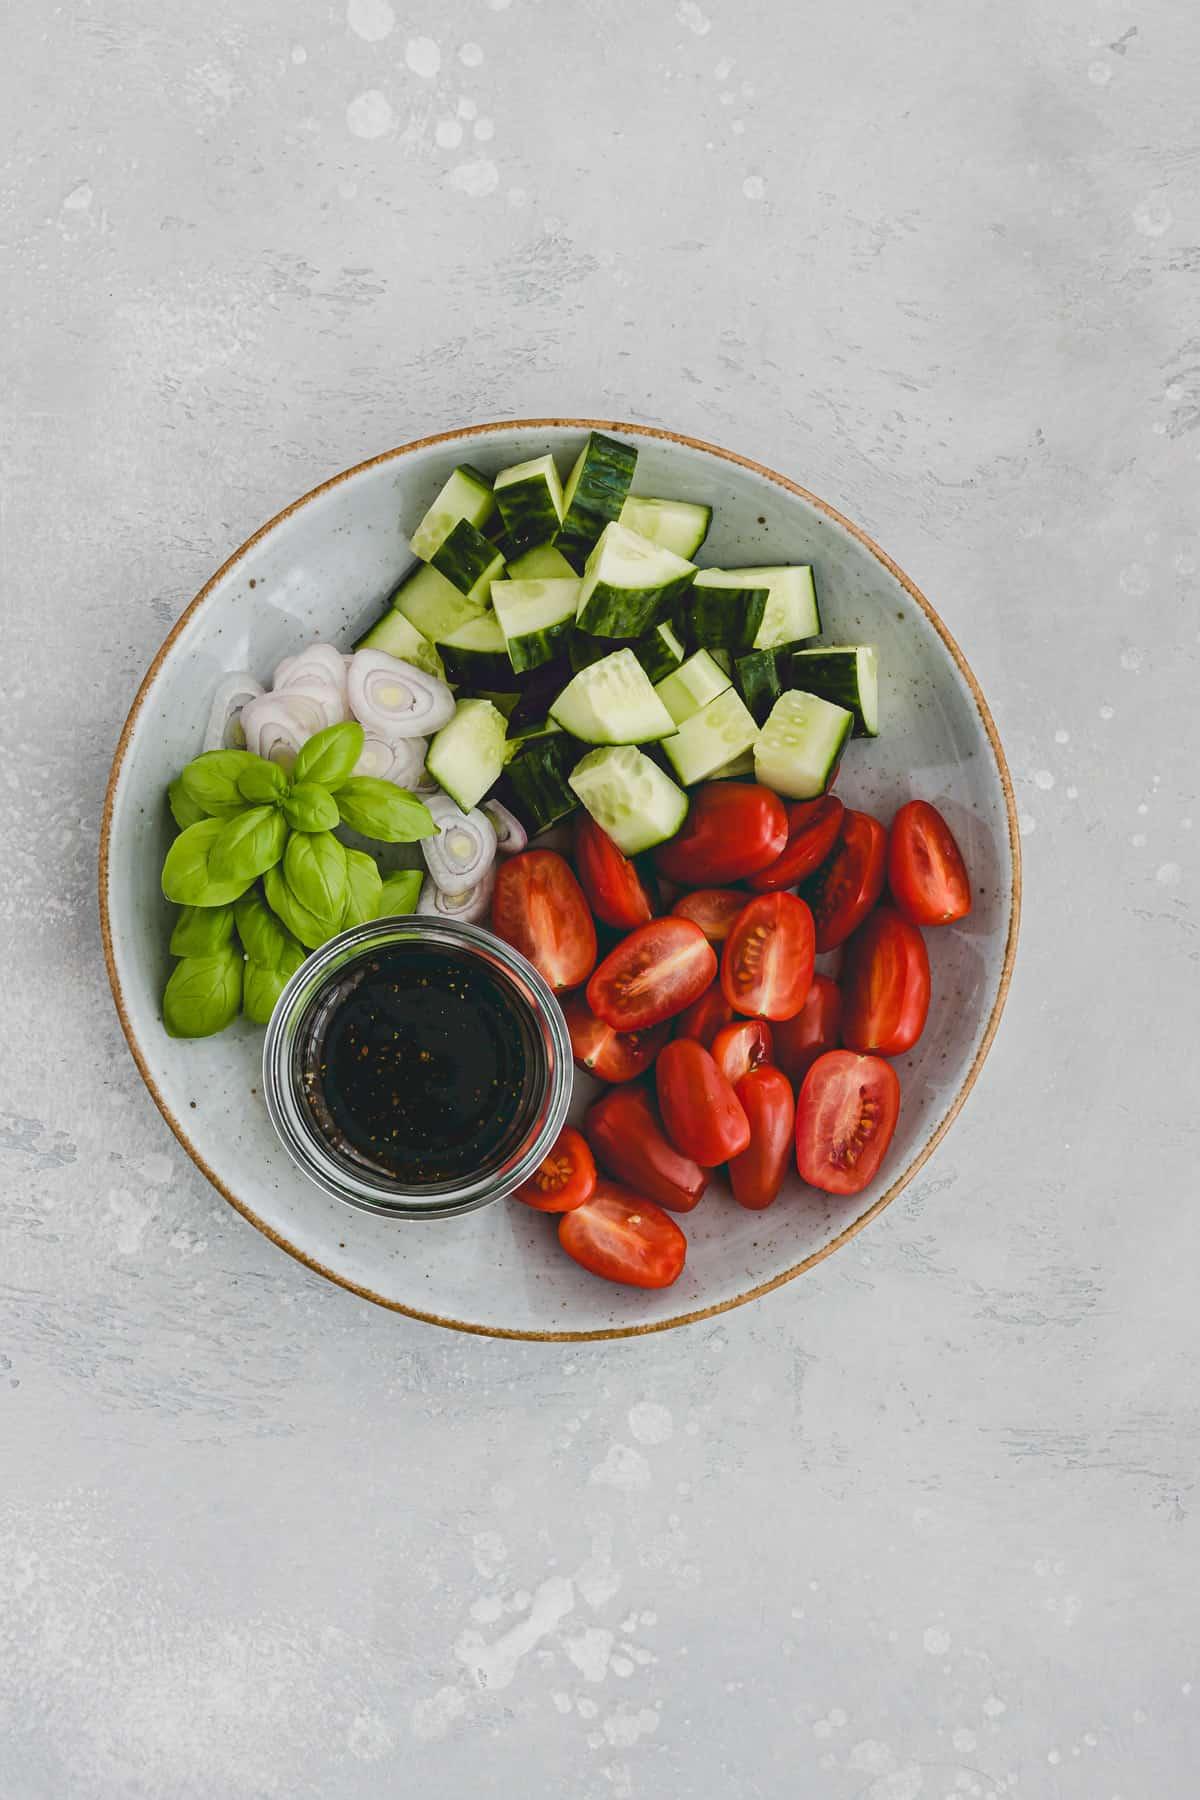 panzanella salad recipe step 2